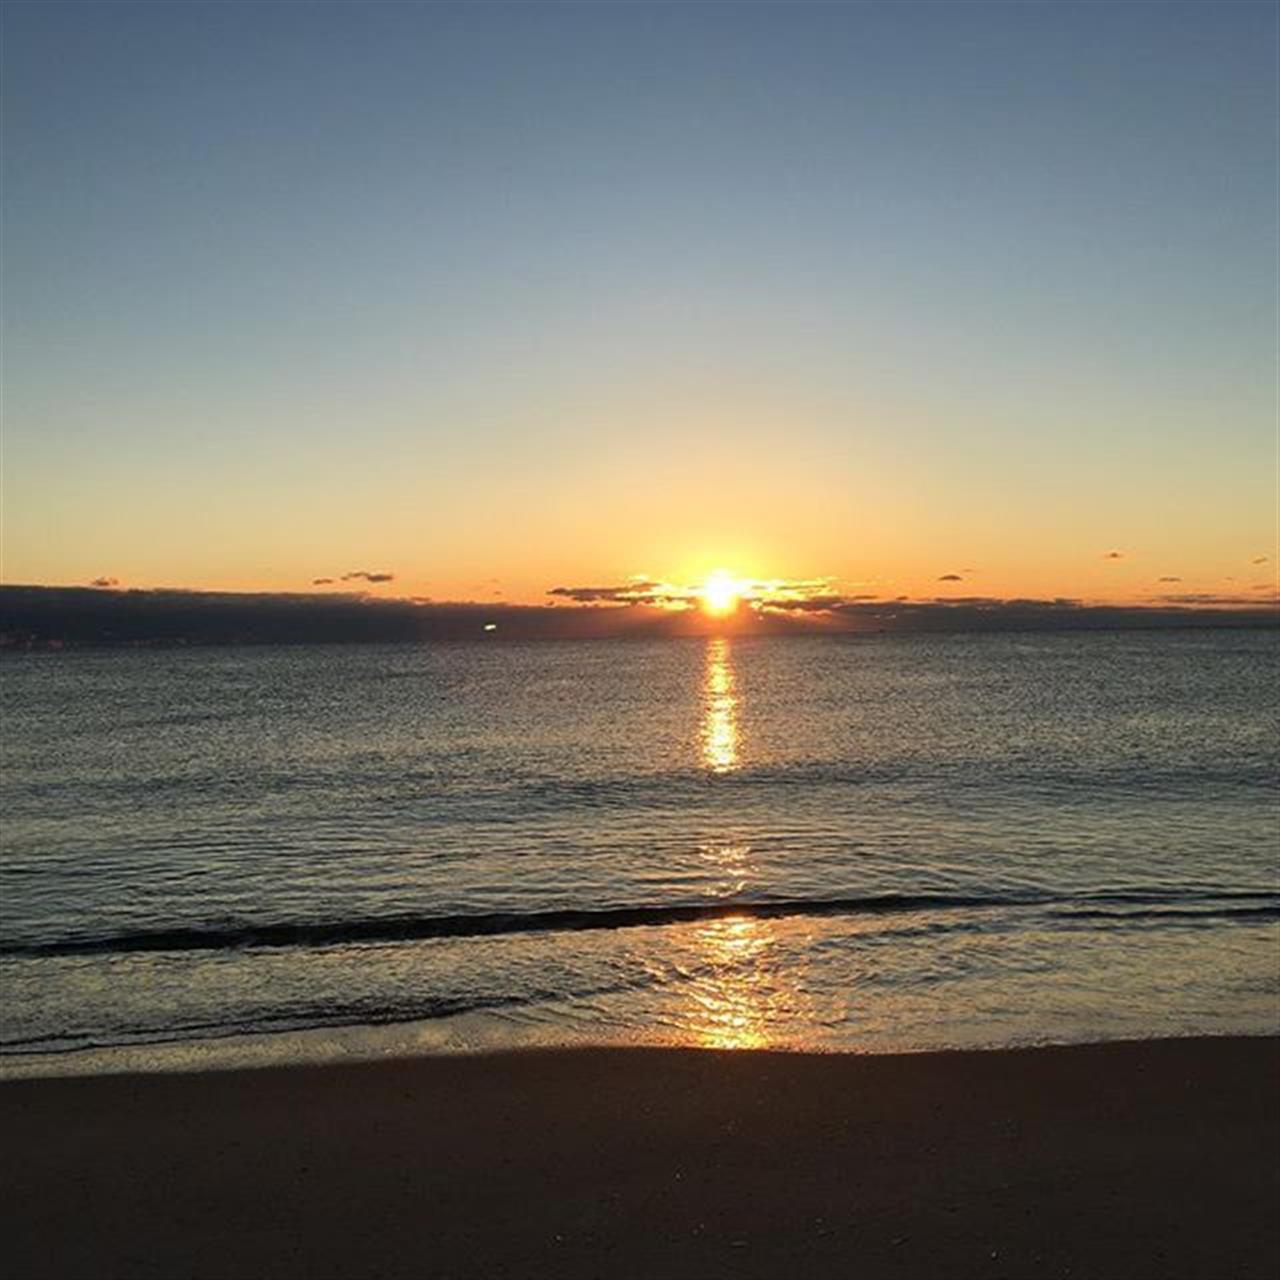 47 degrees at the  beach... #nj #goodmorning #sunrise #beaches  #jshn #leadingrelocal